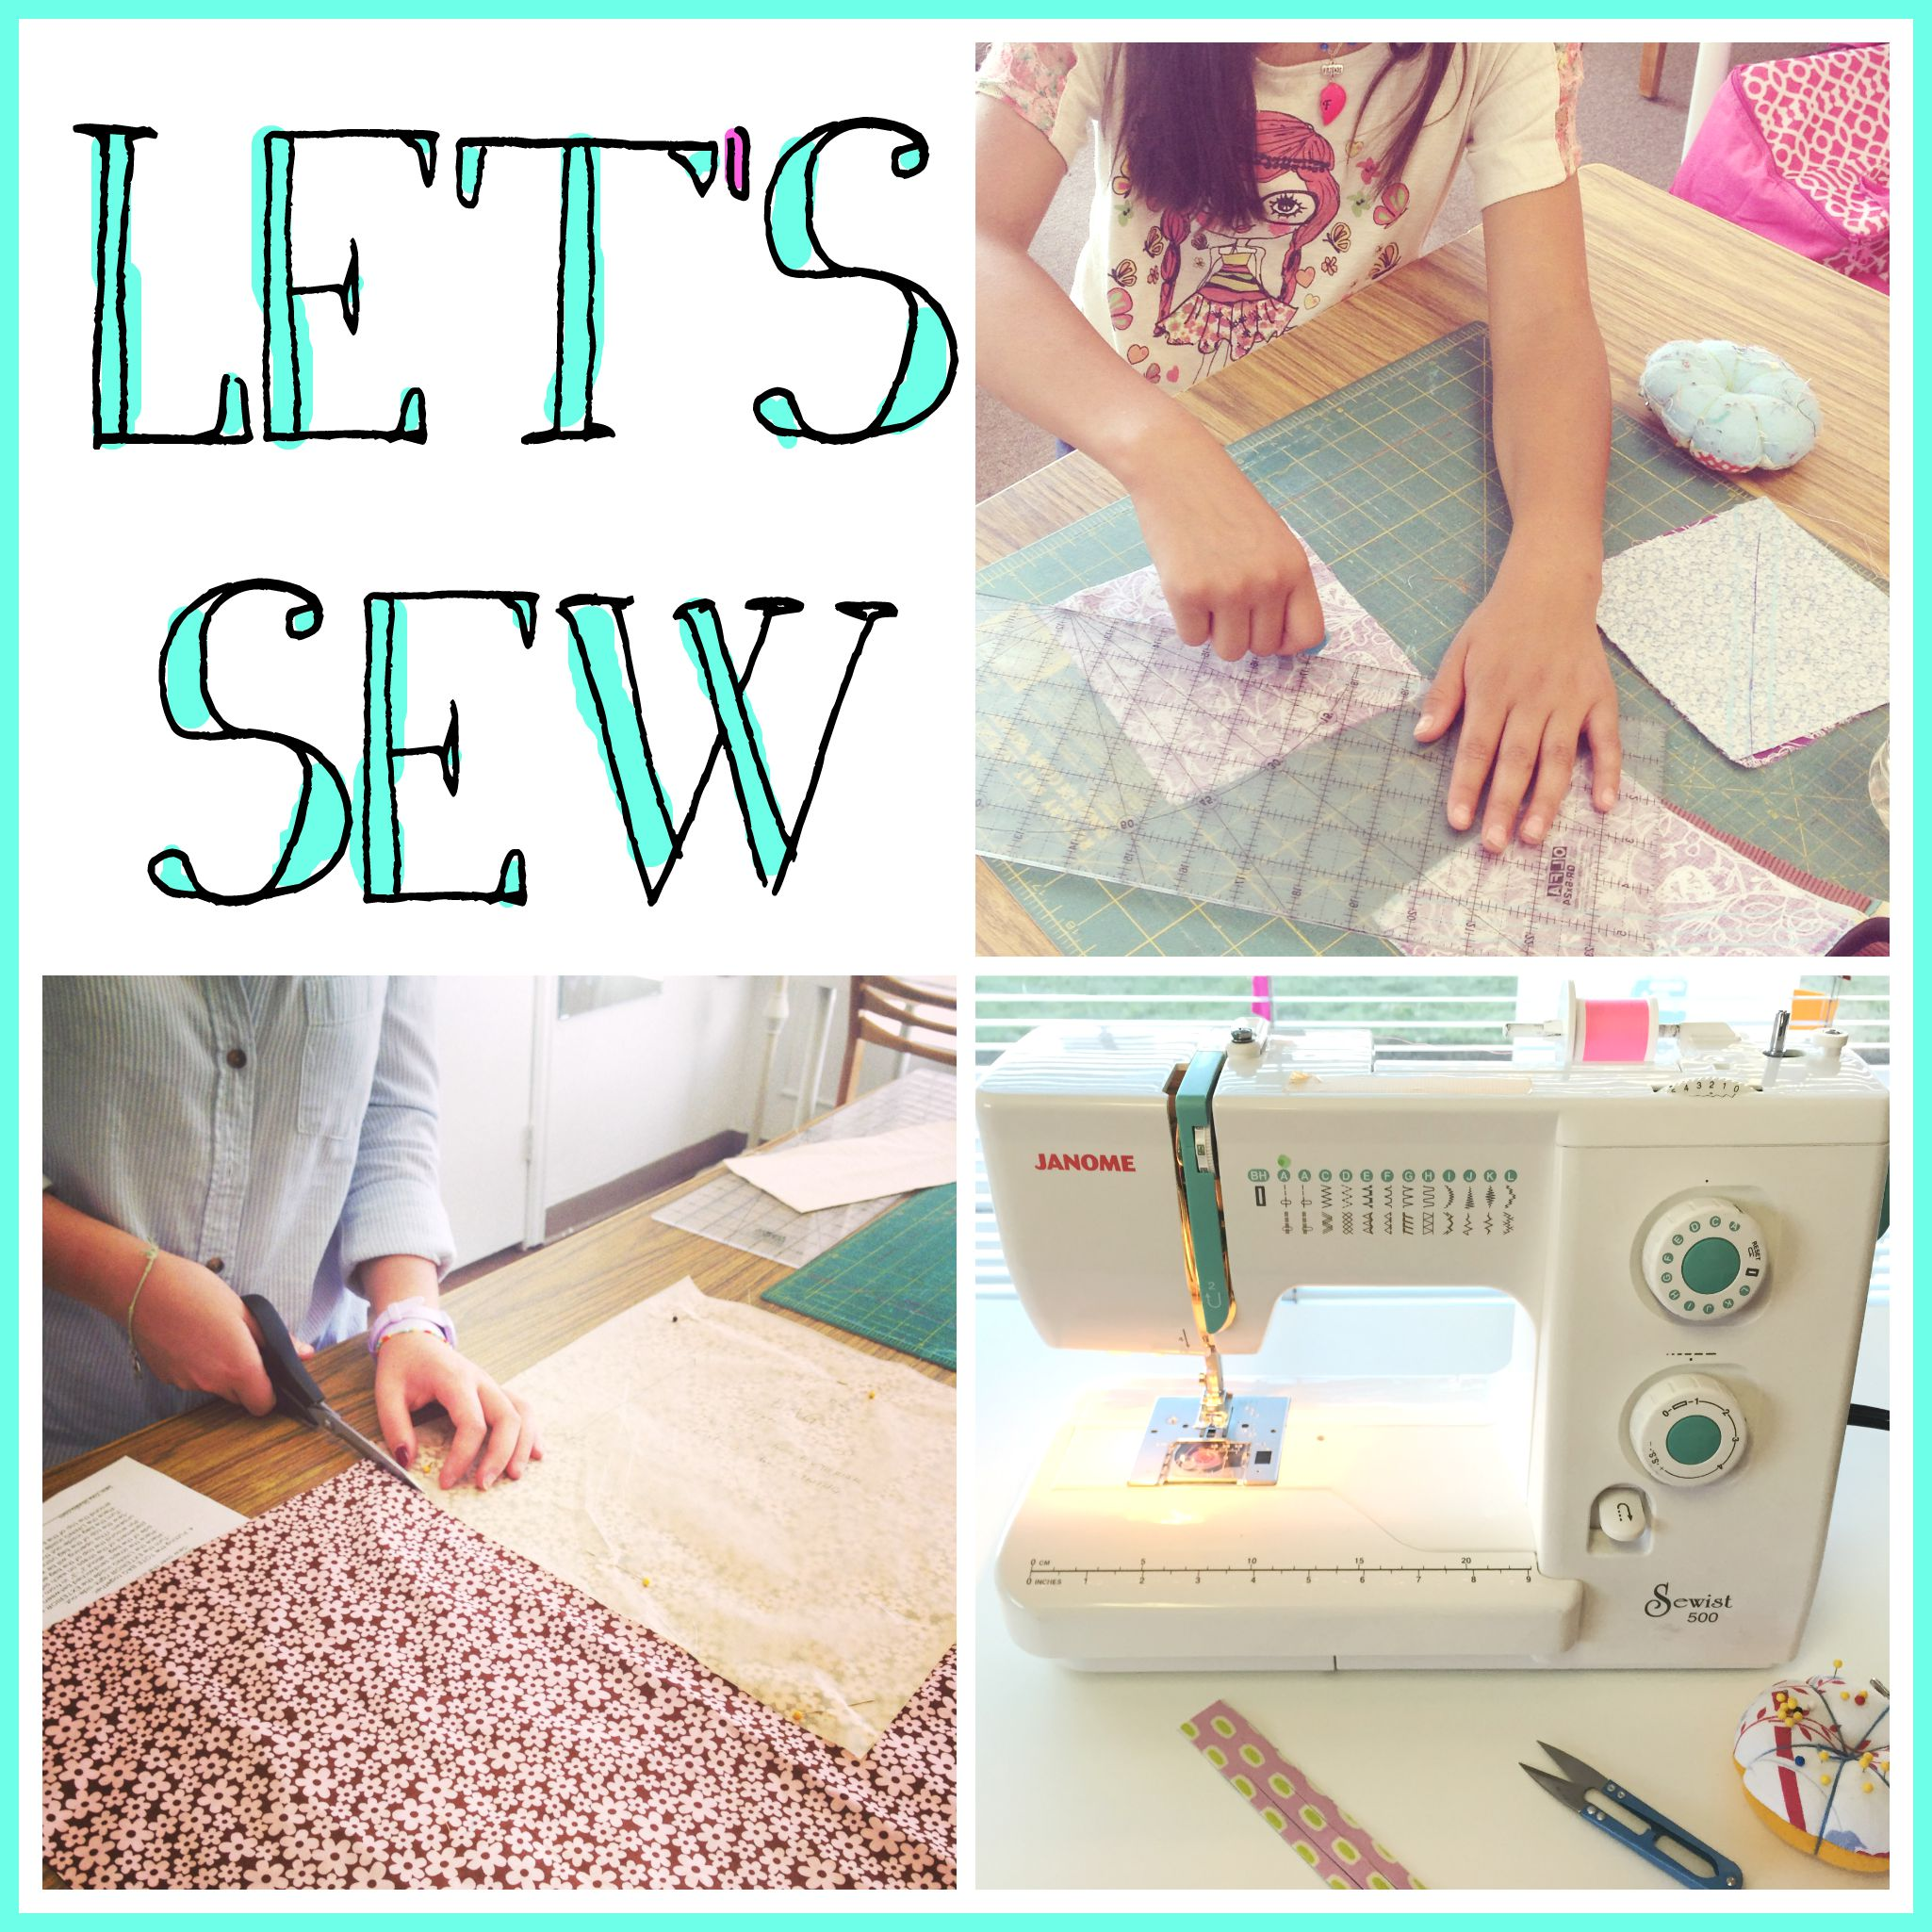 Let's Sew Series | Sew You Studio.com